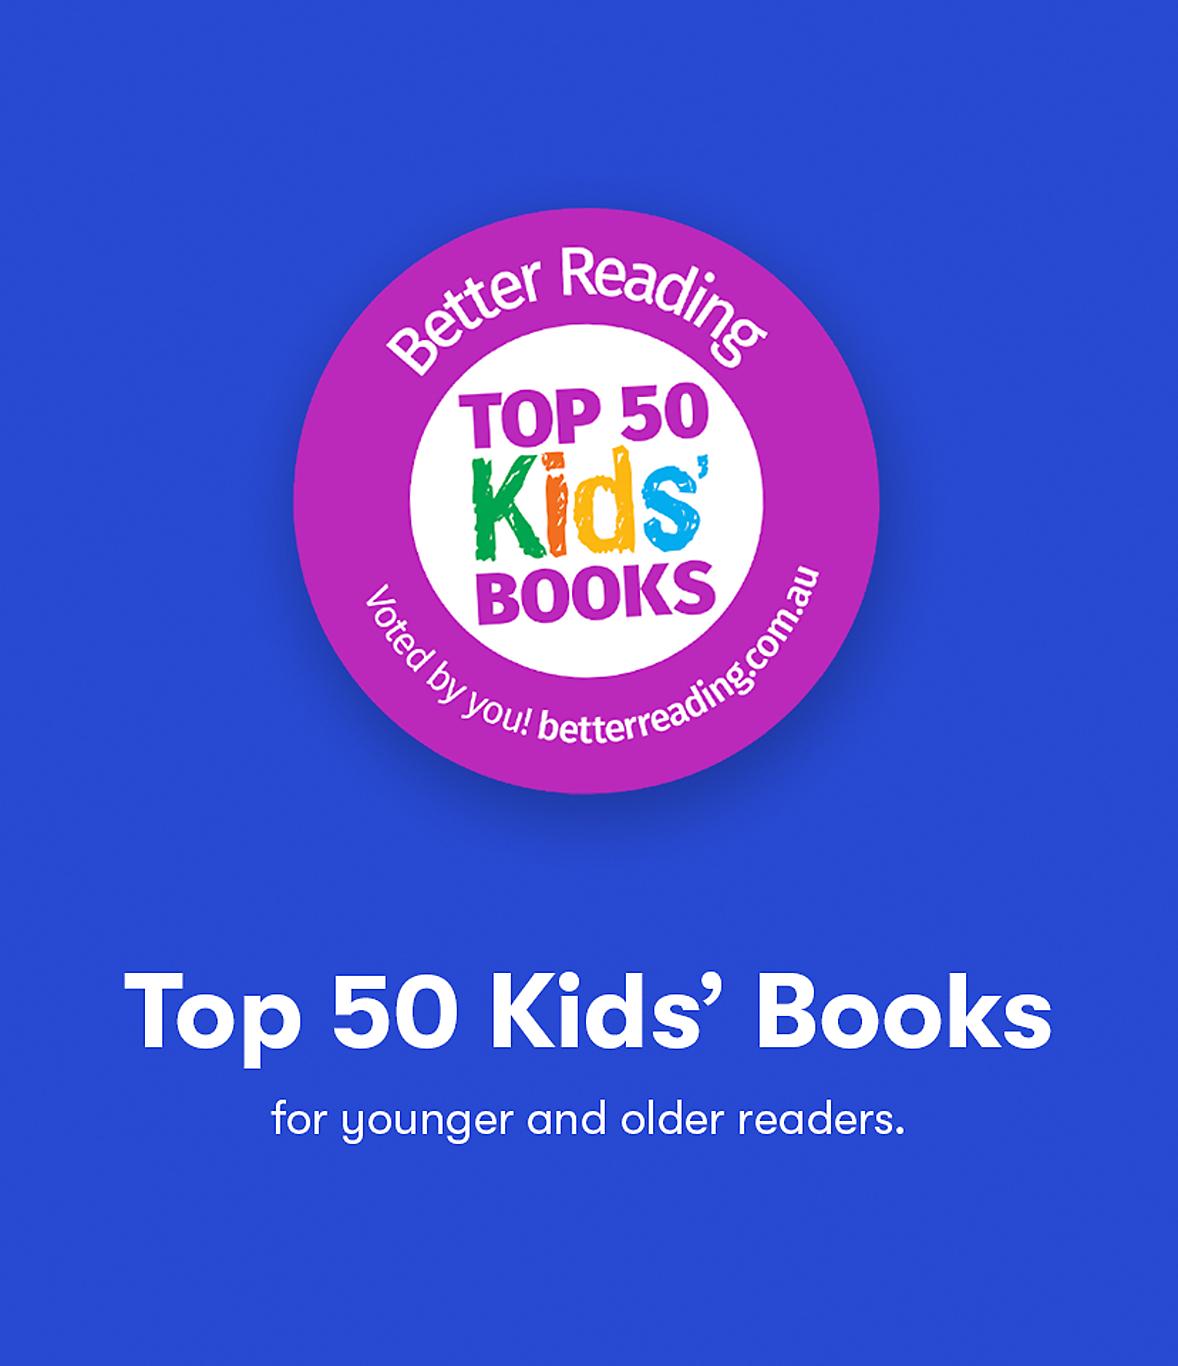 Top 50 Kids' Books